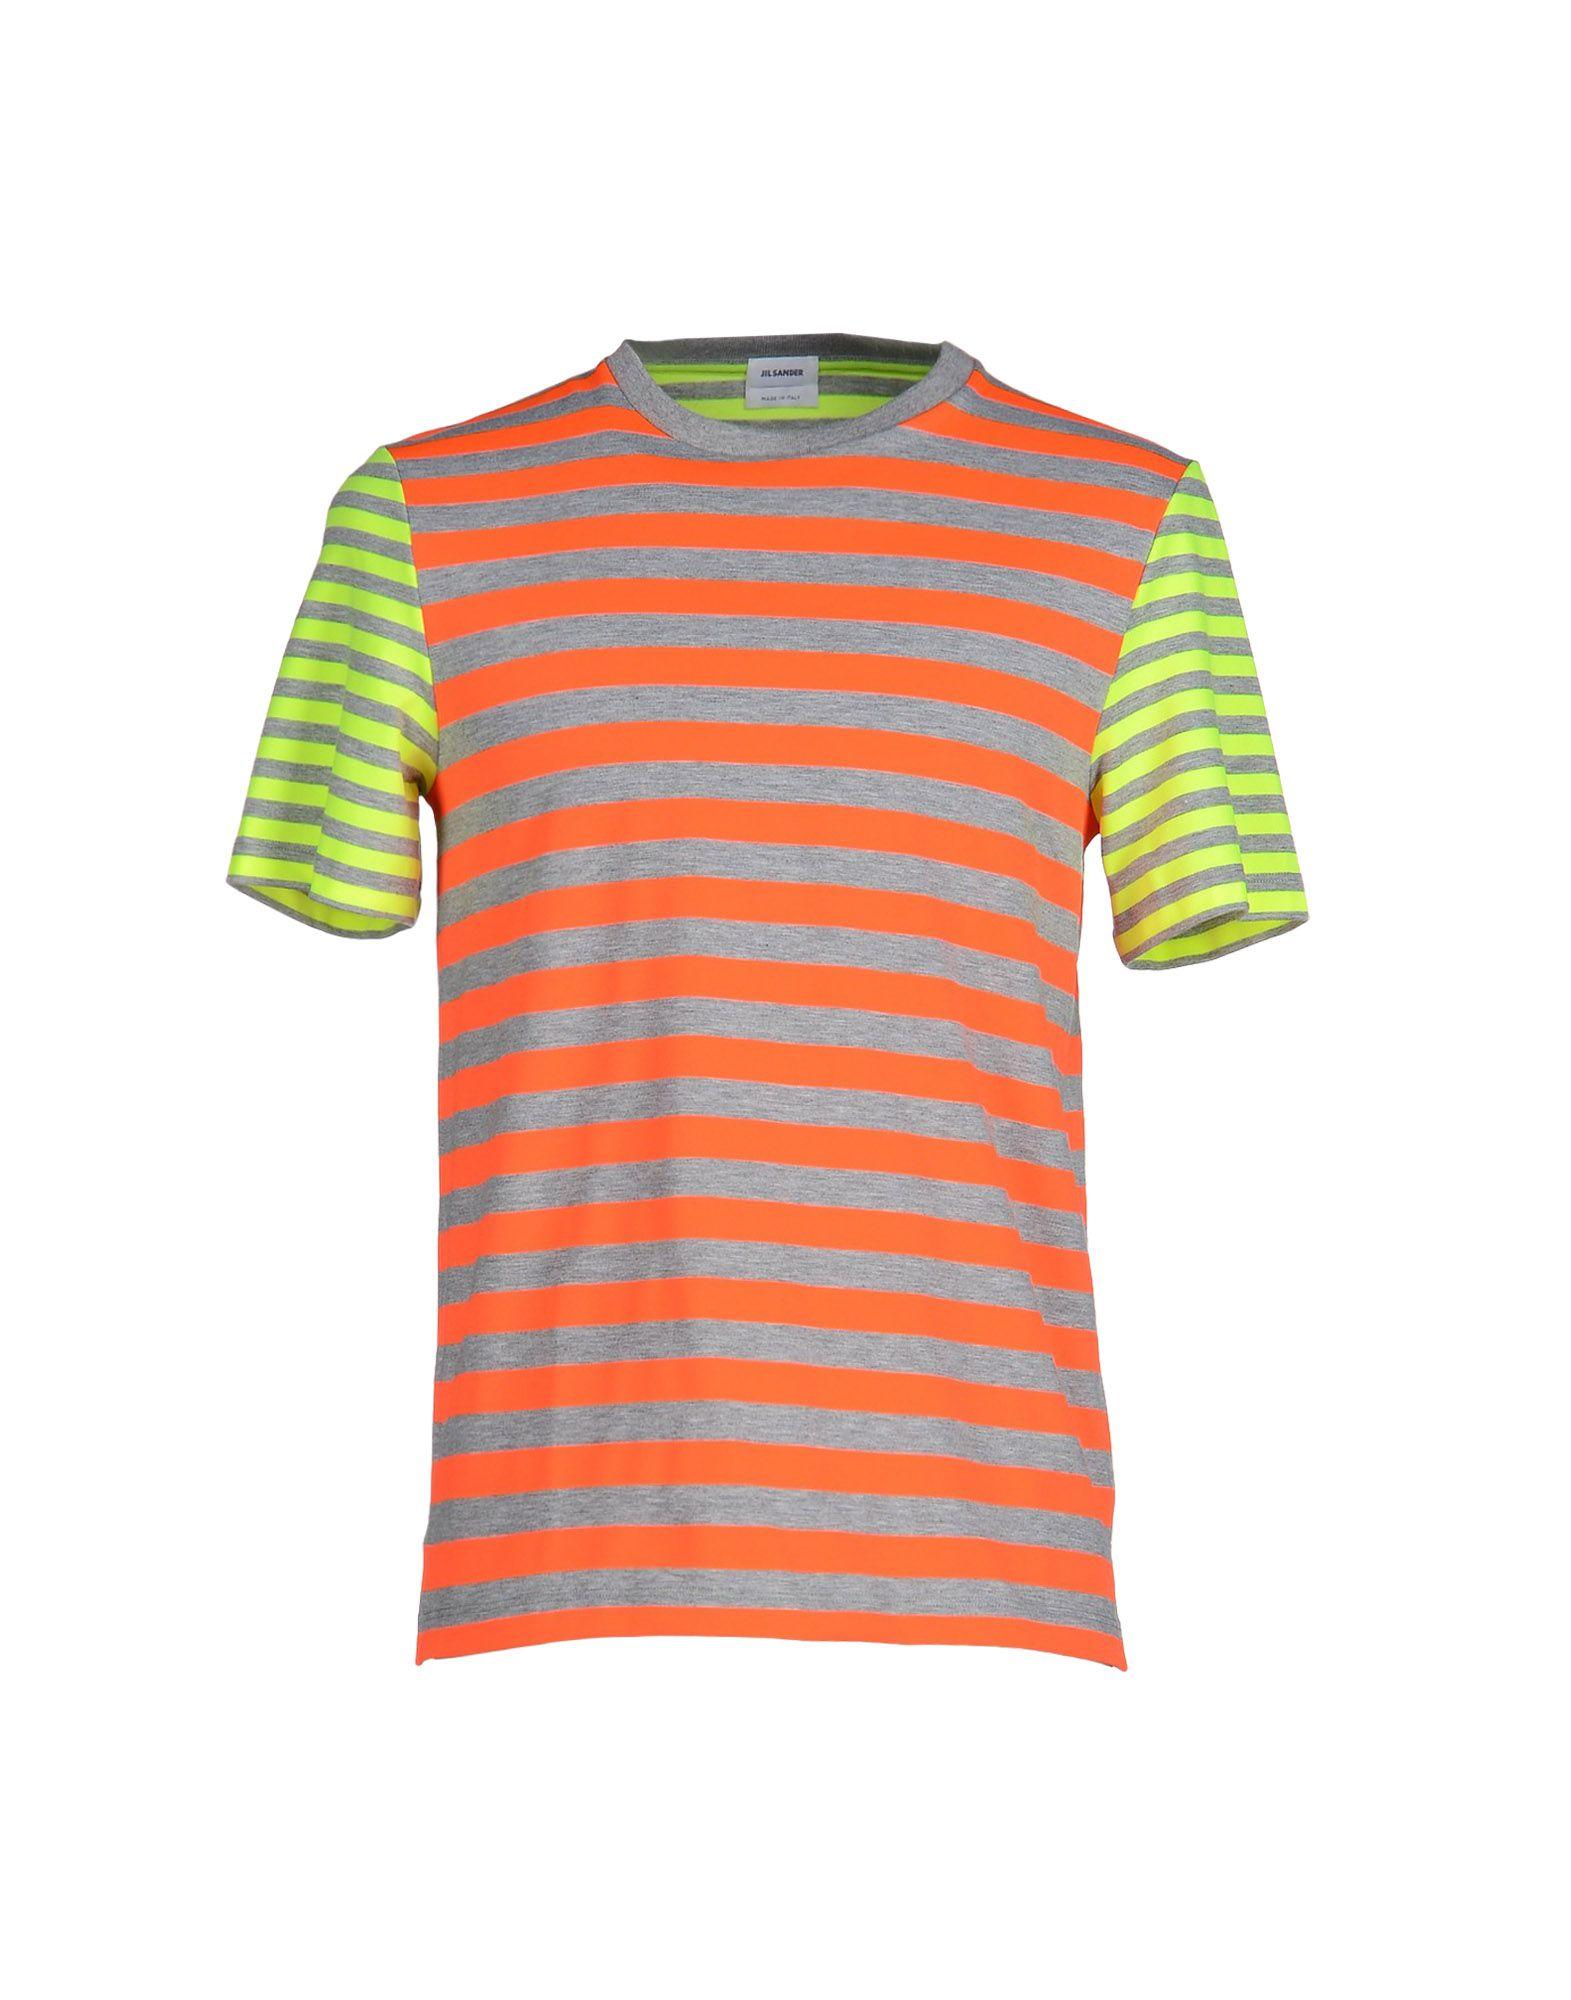 Lyst jil sander t shirt in orange for men for Jil sander mens shirt